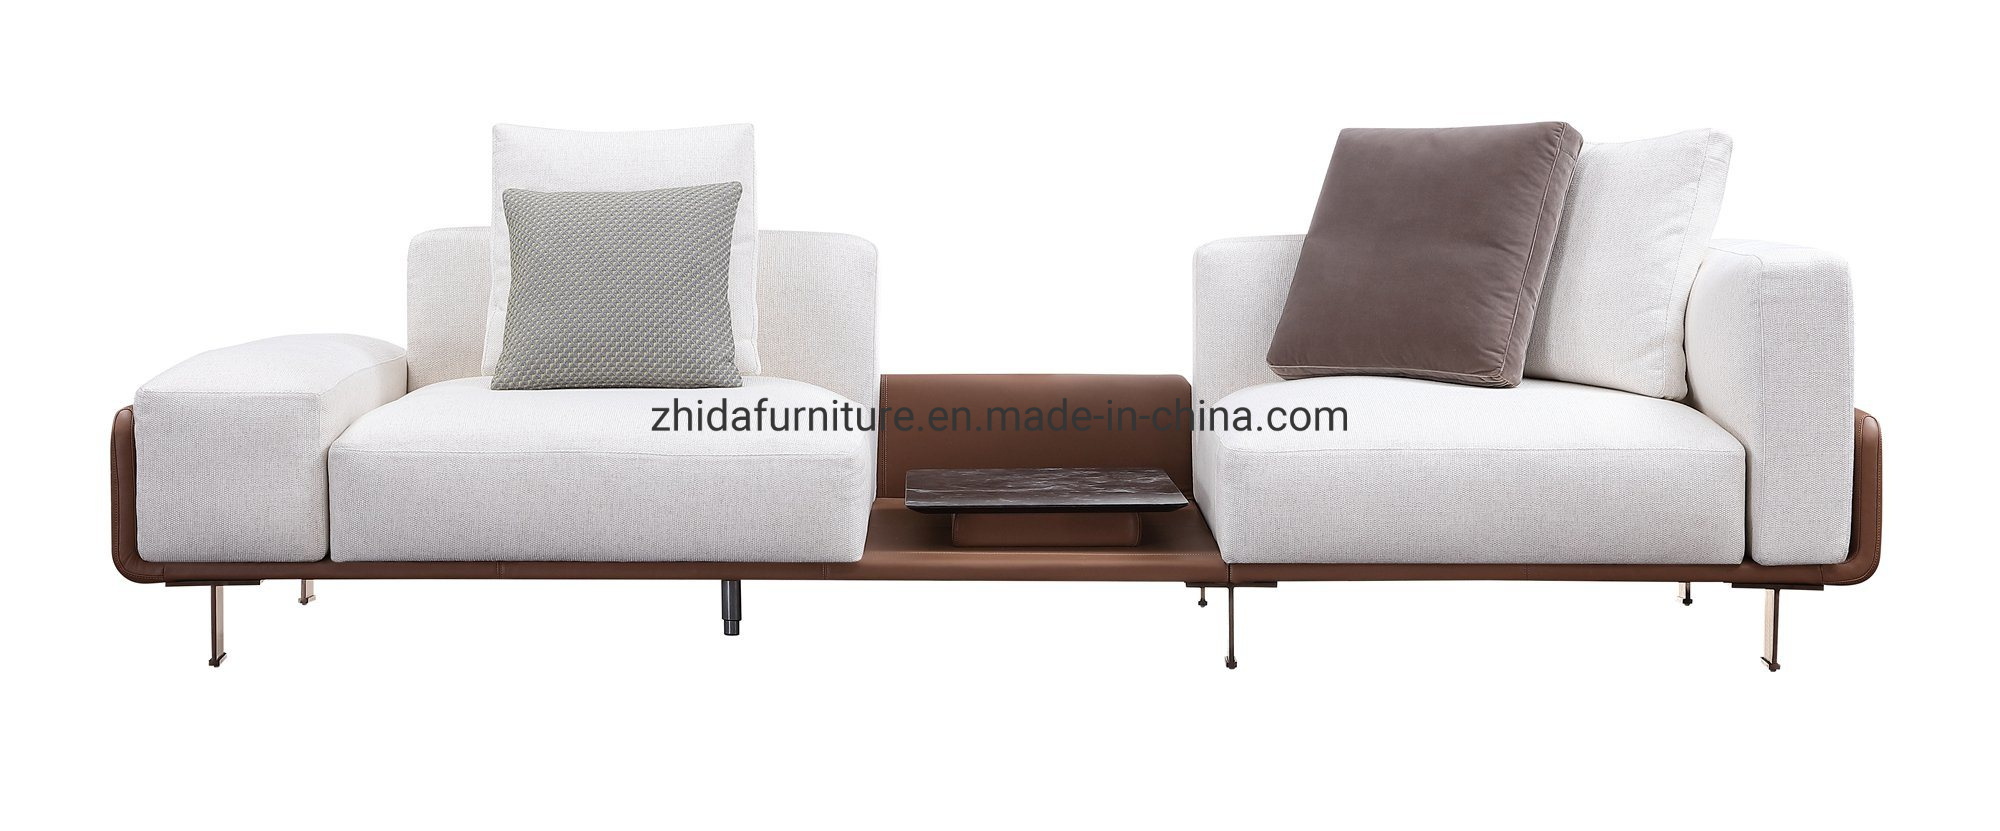 [Hot Item] Modern Furniture Lobby Fabric Leather L Shape Living Room Sofa